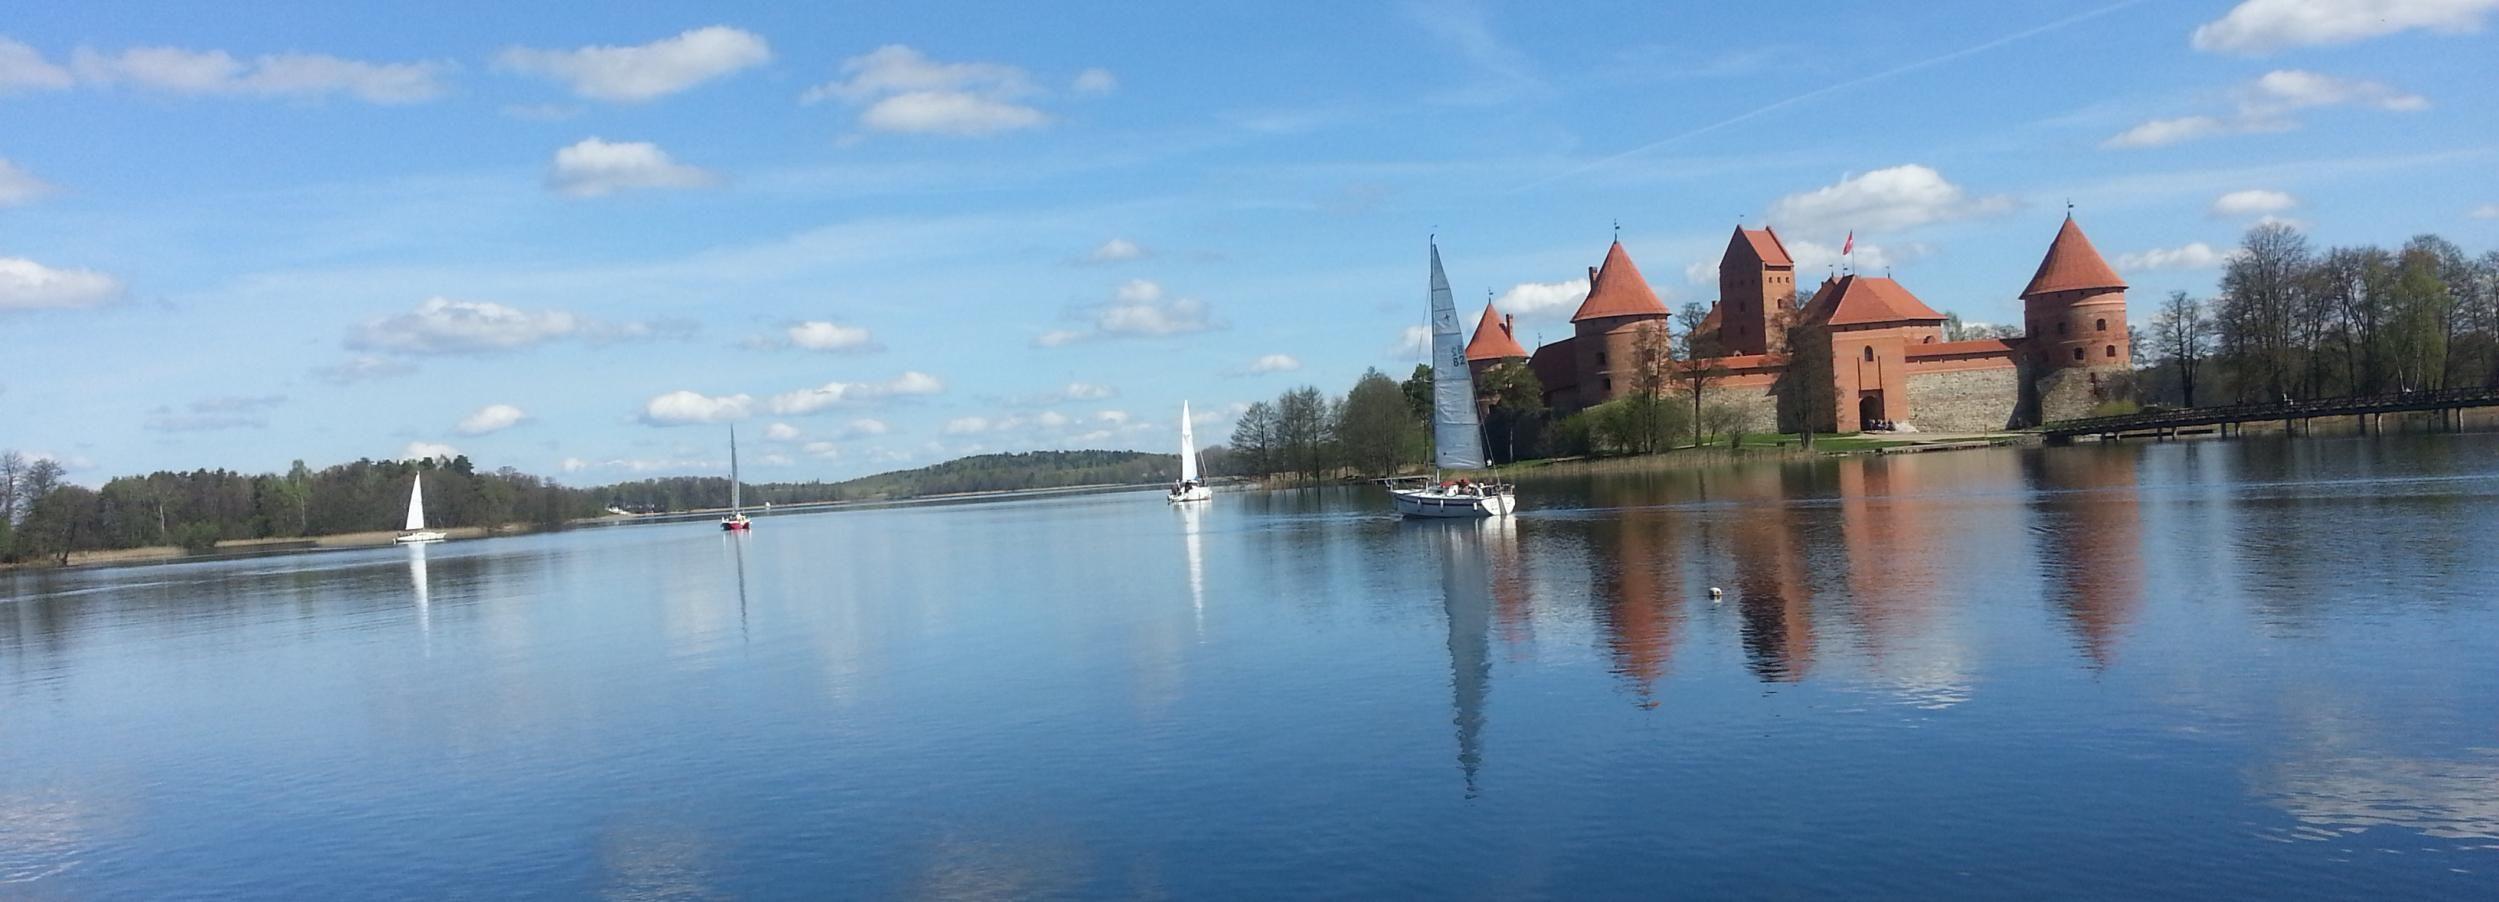 Vilnius, Trakai e Kernave Privada Full-Day Tour